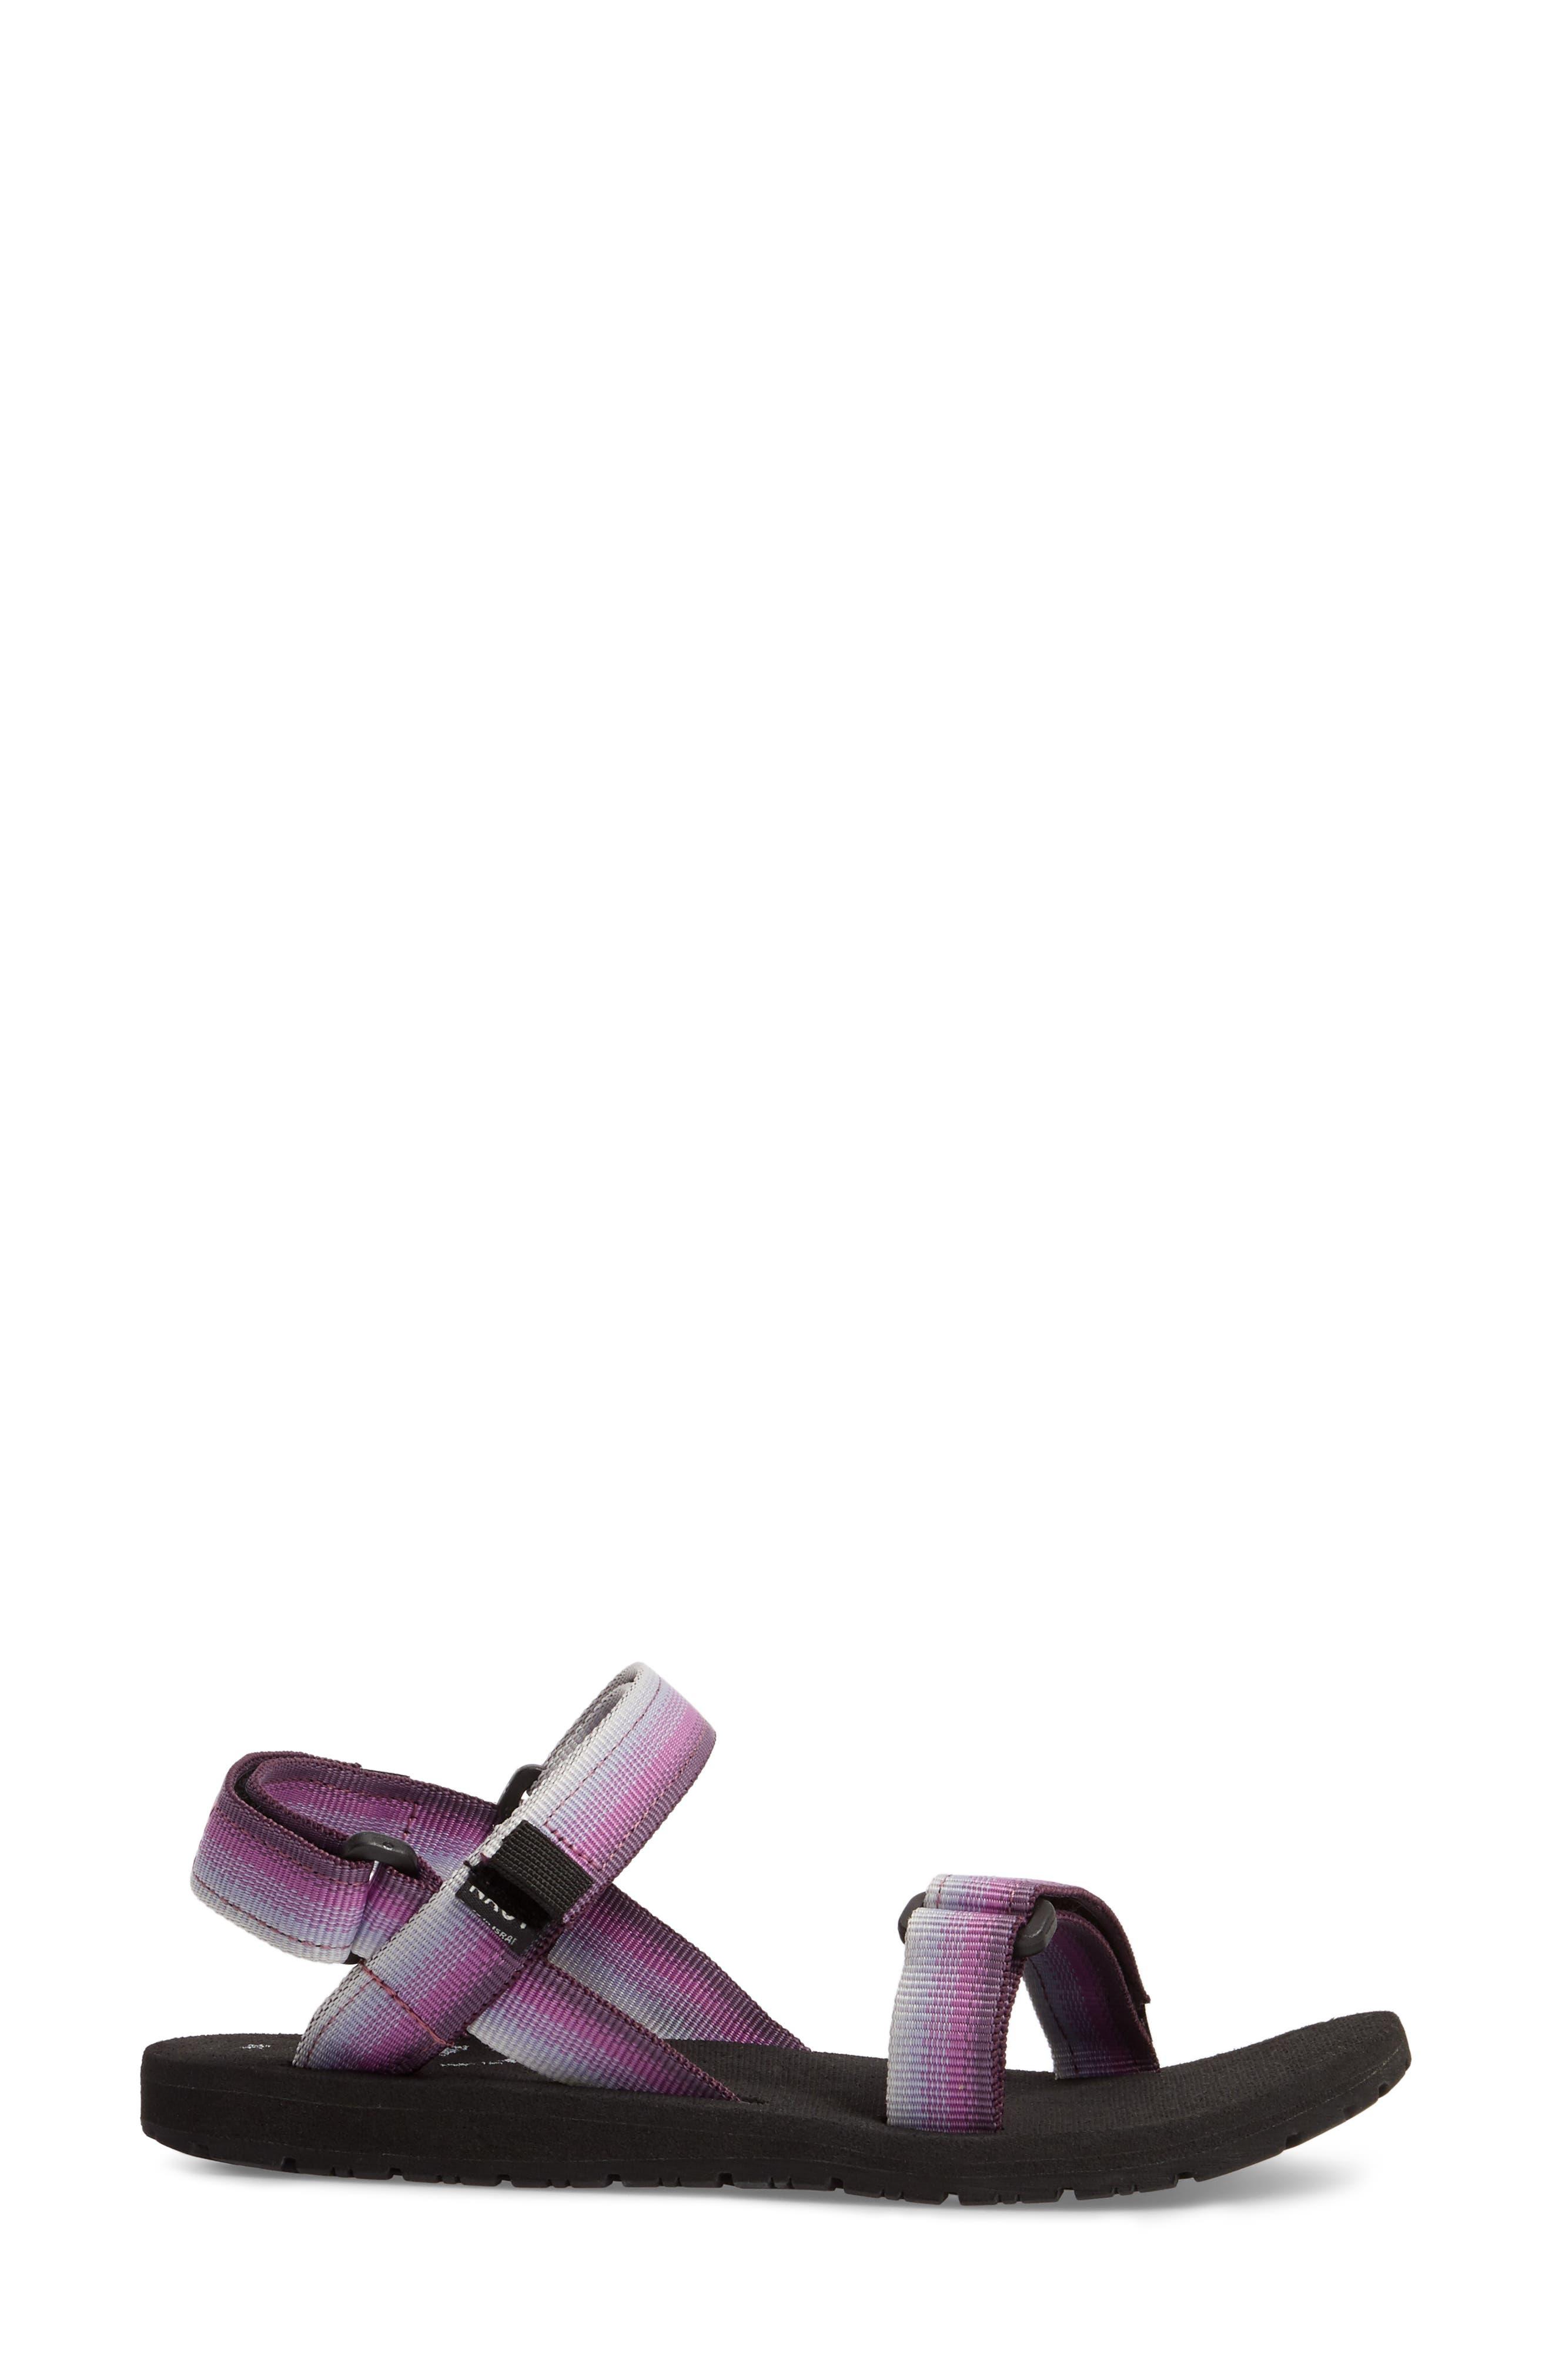 Haven Waterproof Sandal,                             Alternate thumbnail 3, color,                             Purple Sunset Fabric